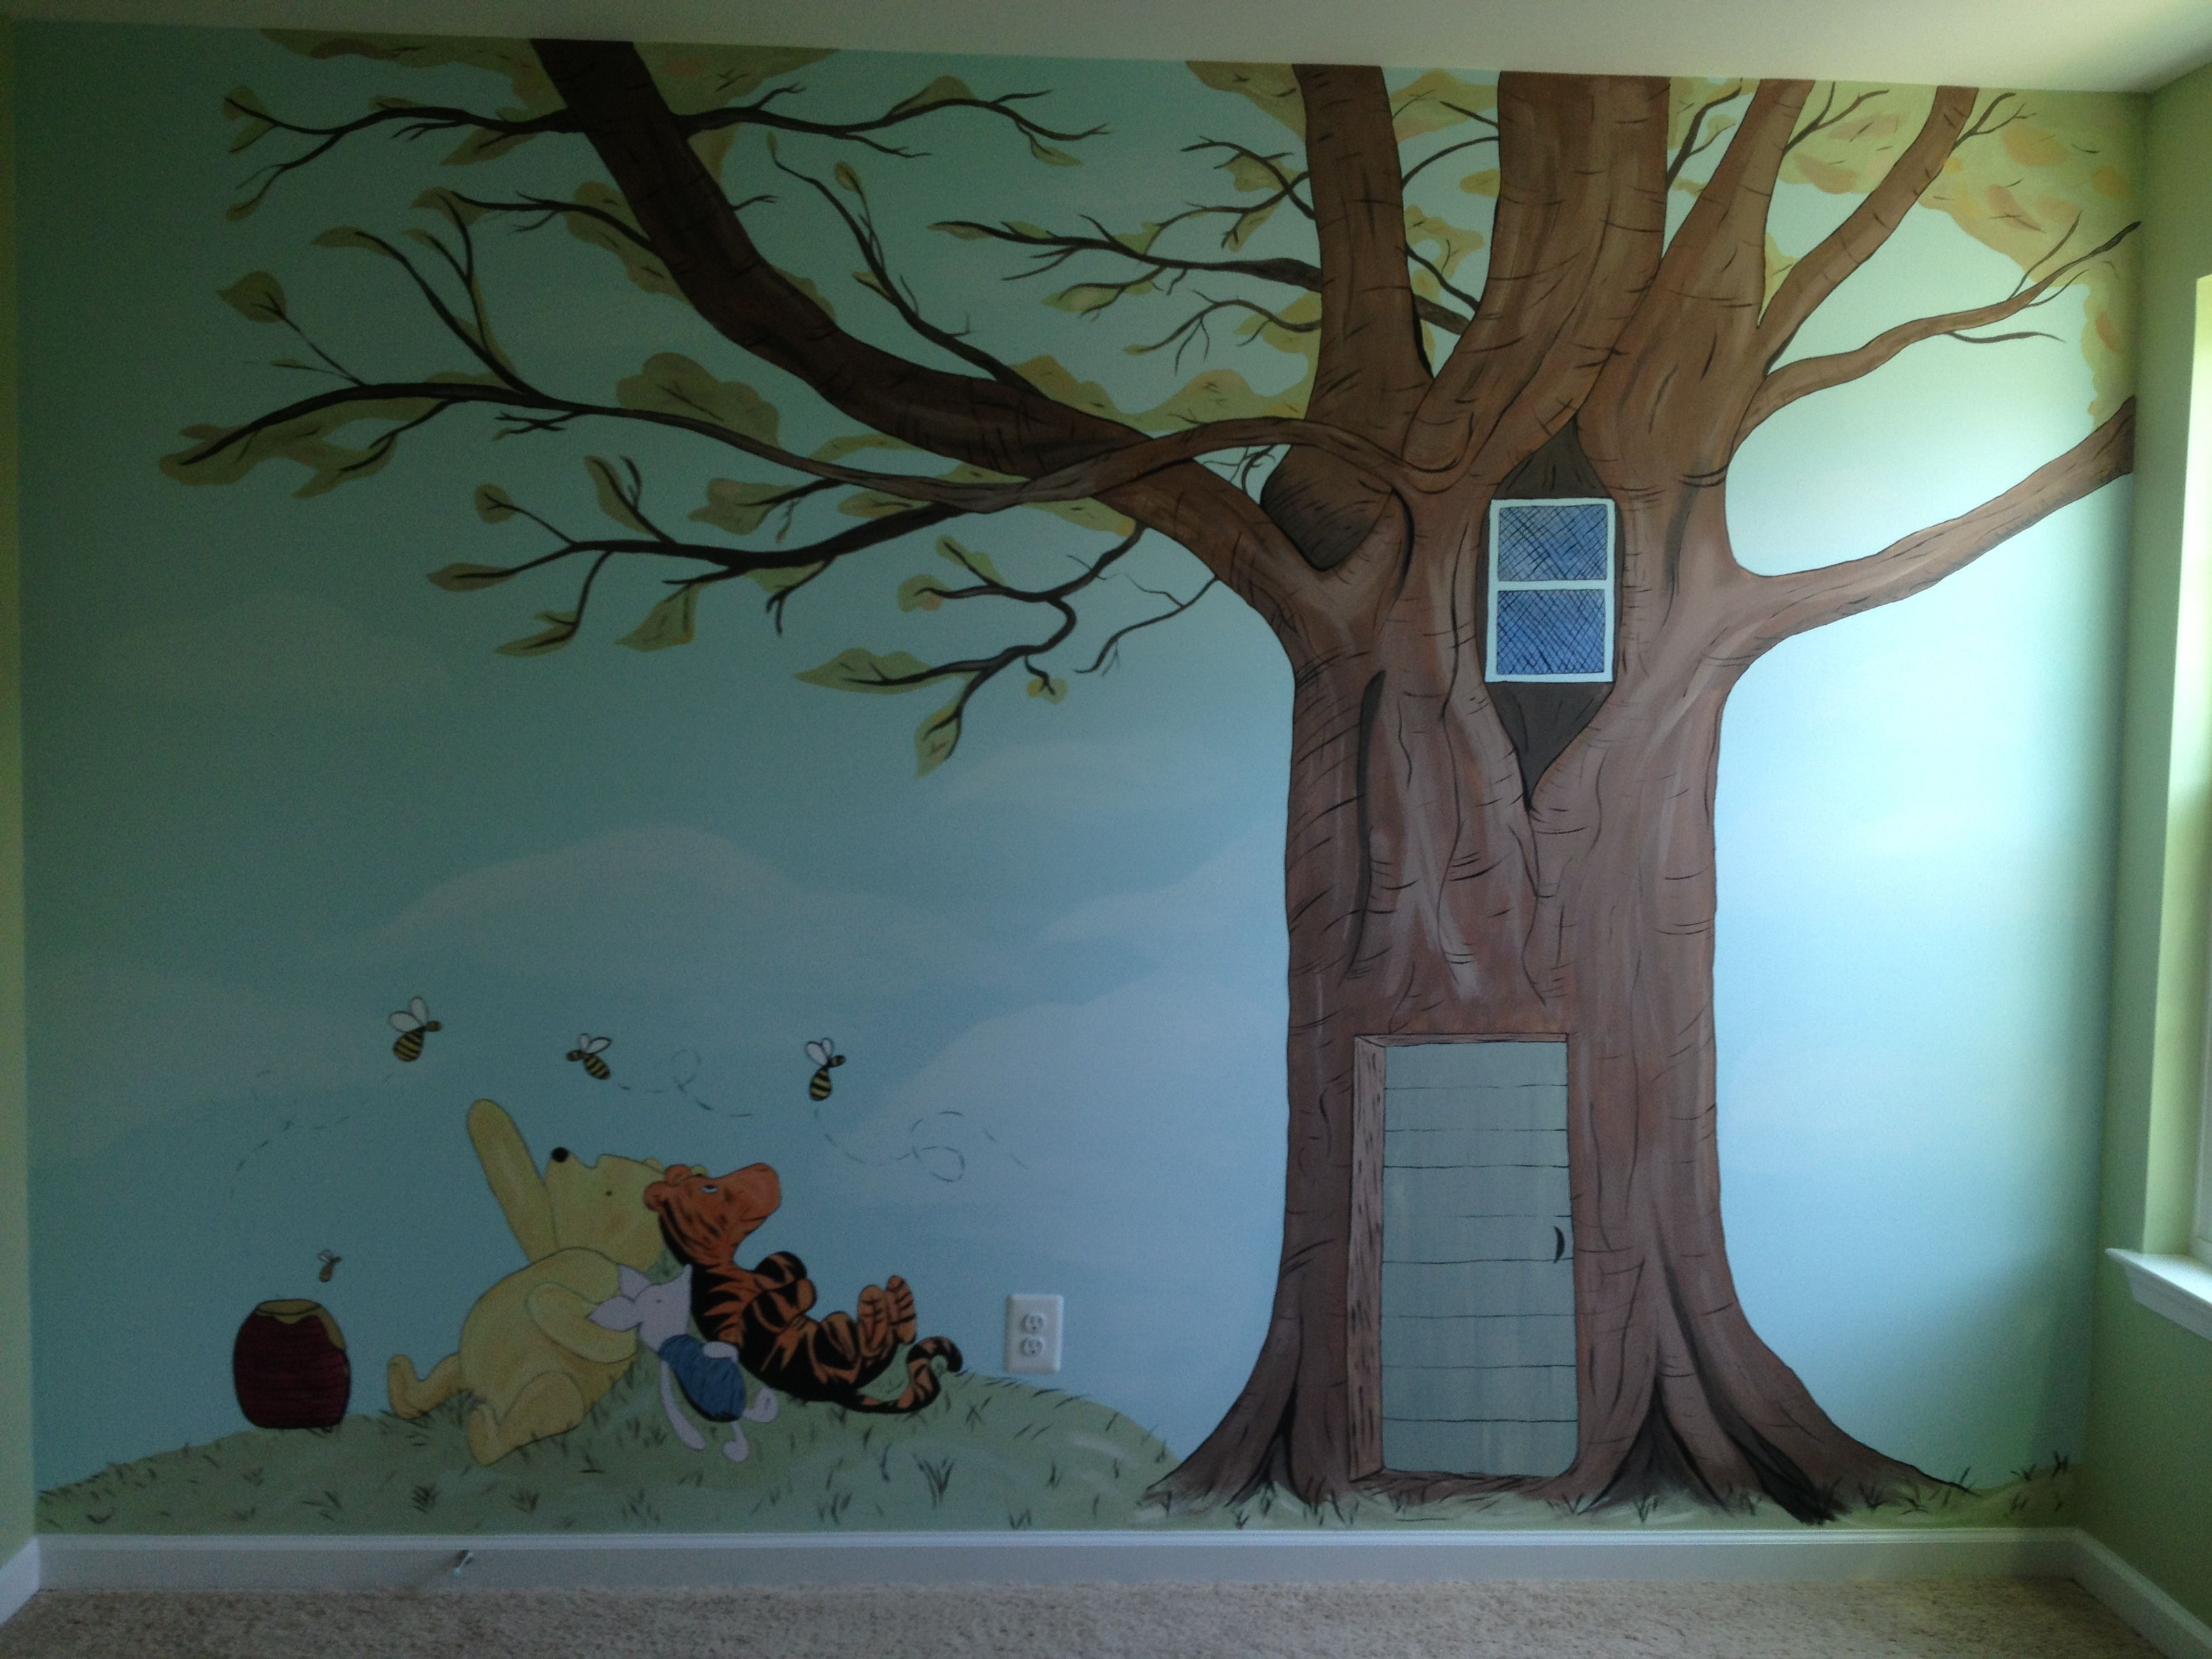 Classic Winnie The Pooh Nursery Wall Mural Winnie The Pooh